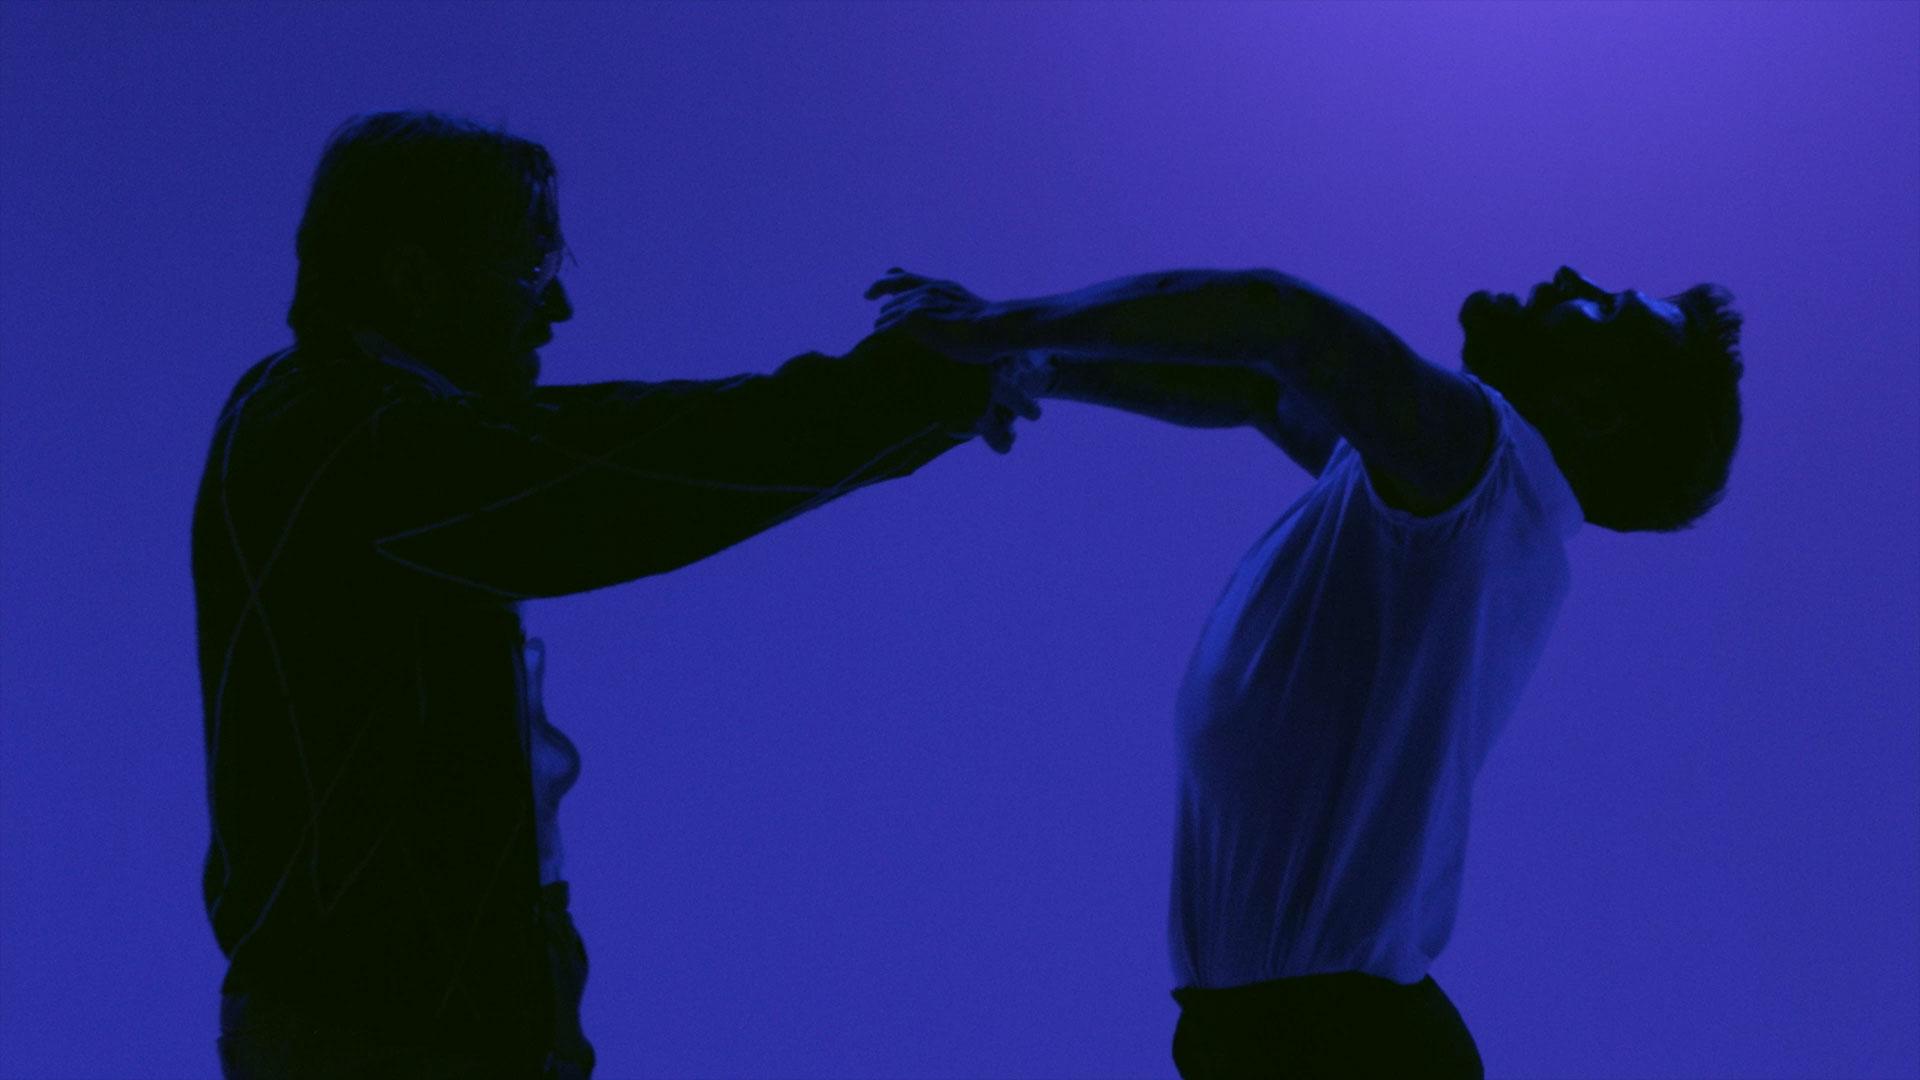 Two men holding hands against a blue/purple backdrop.